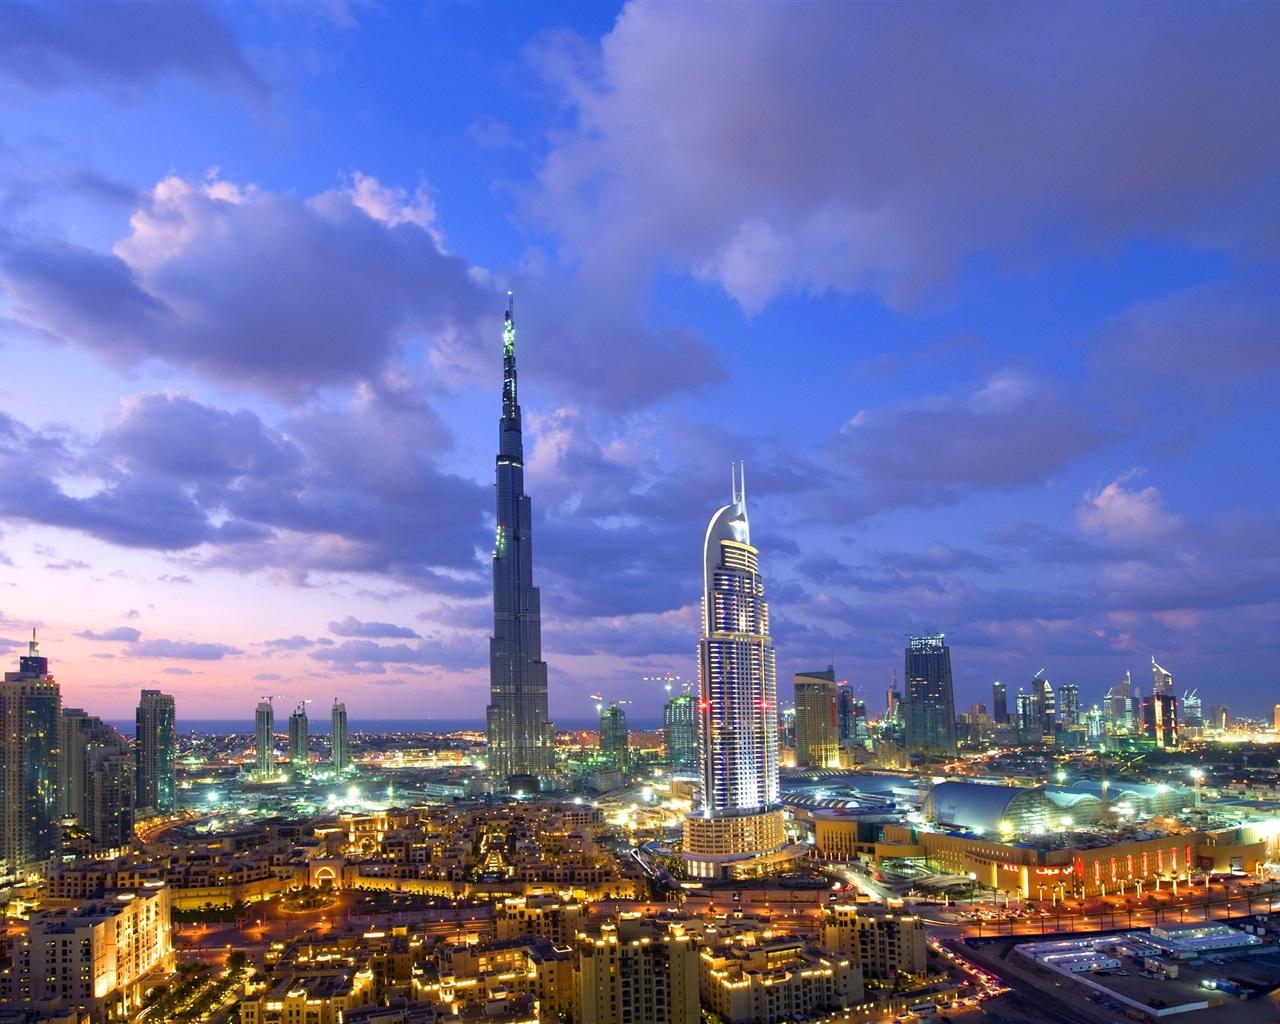 Dubai burj khalifa rascacielos noches las luces fondos for Luxury holidays in dubai